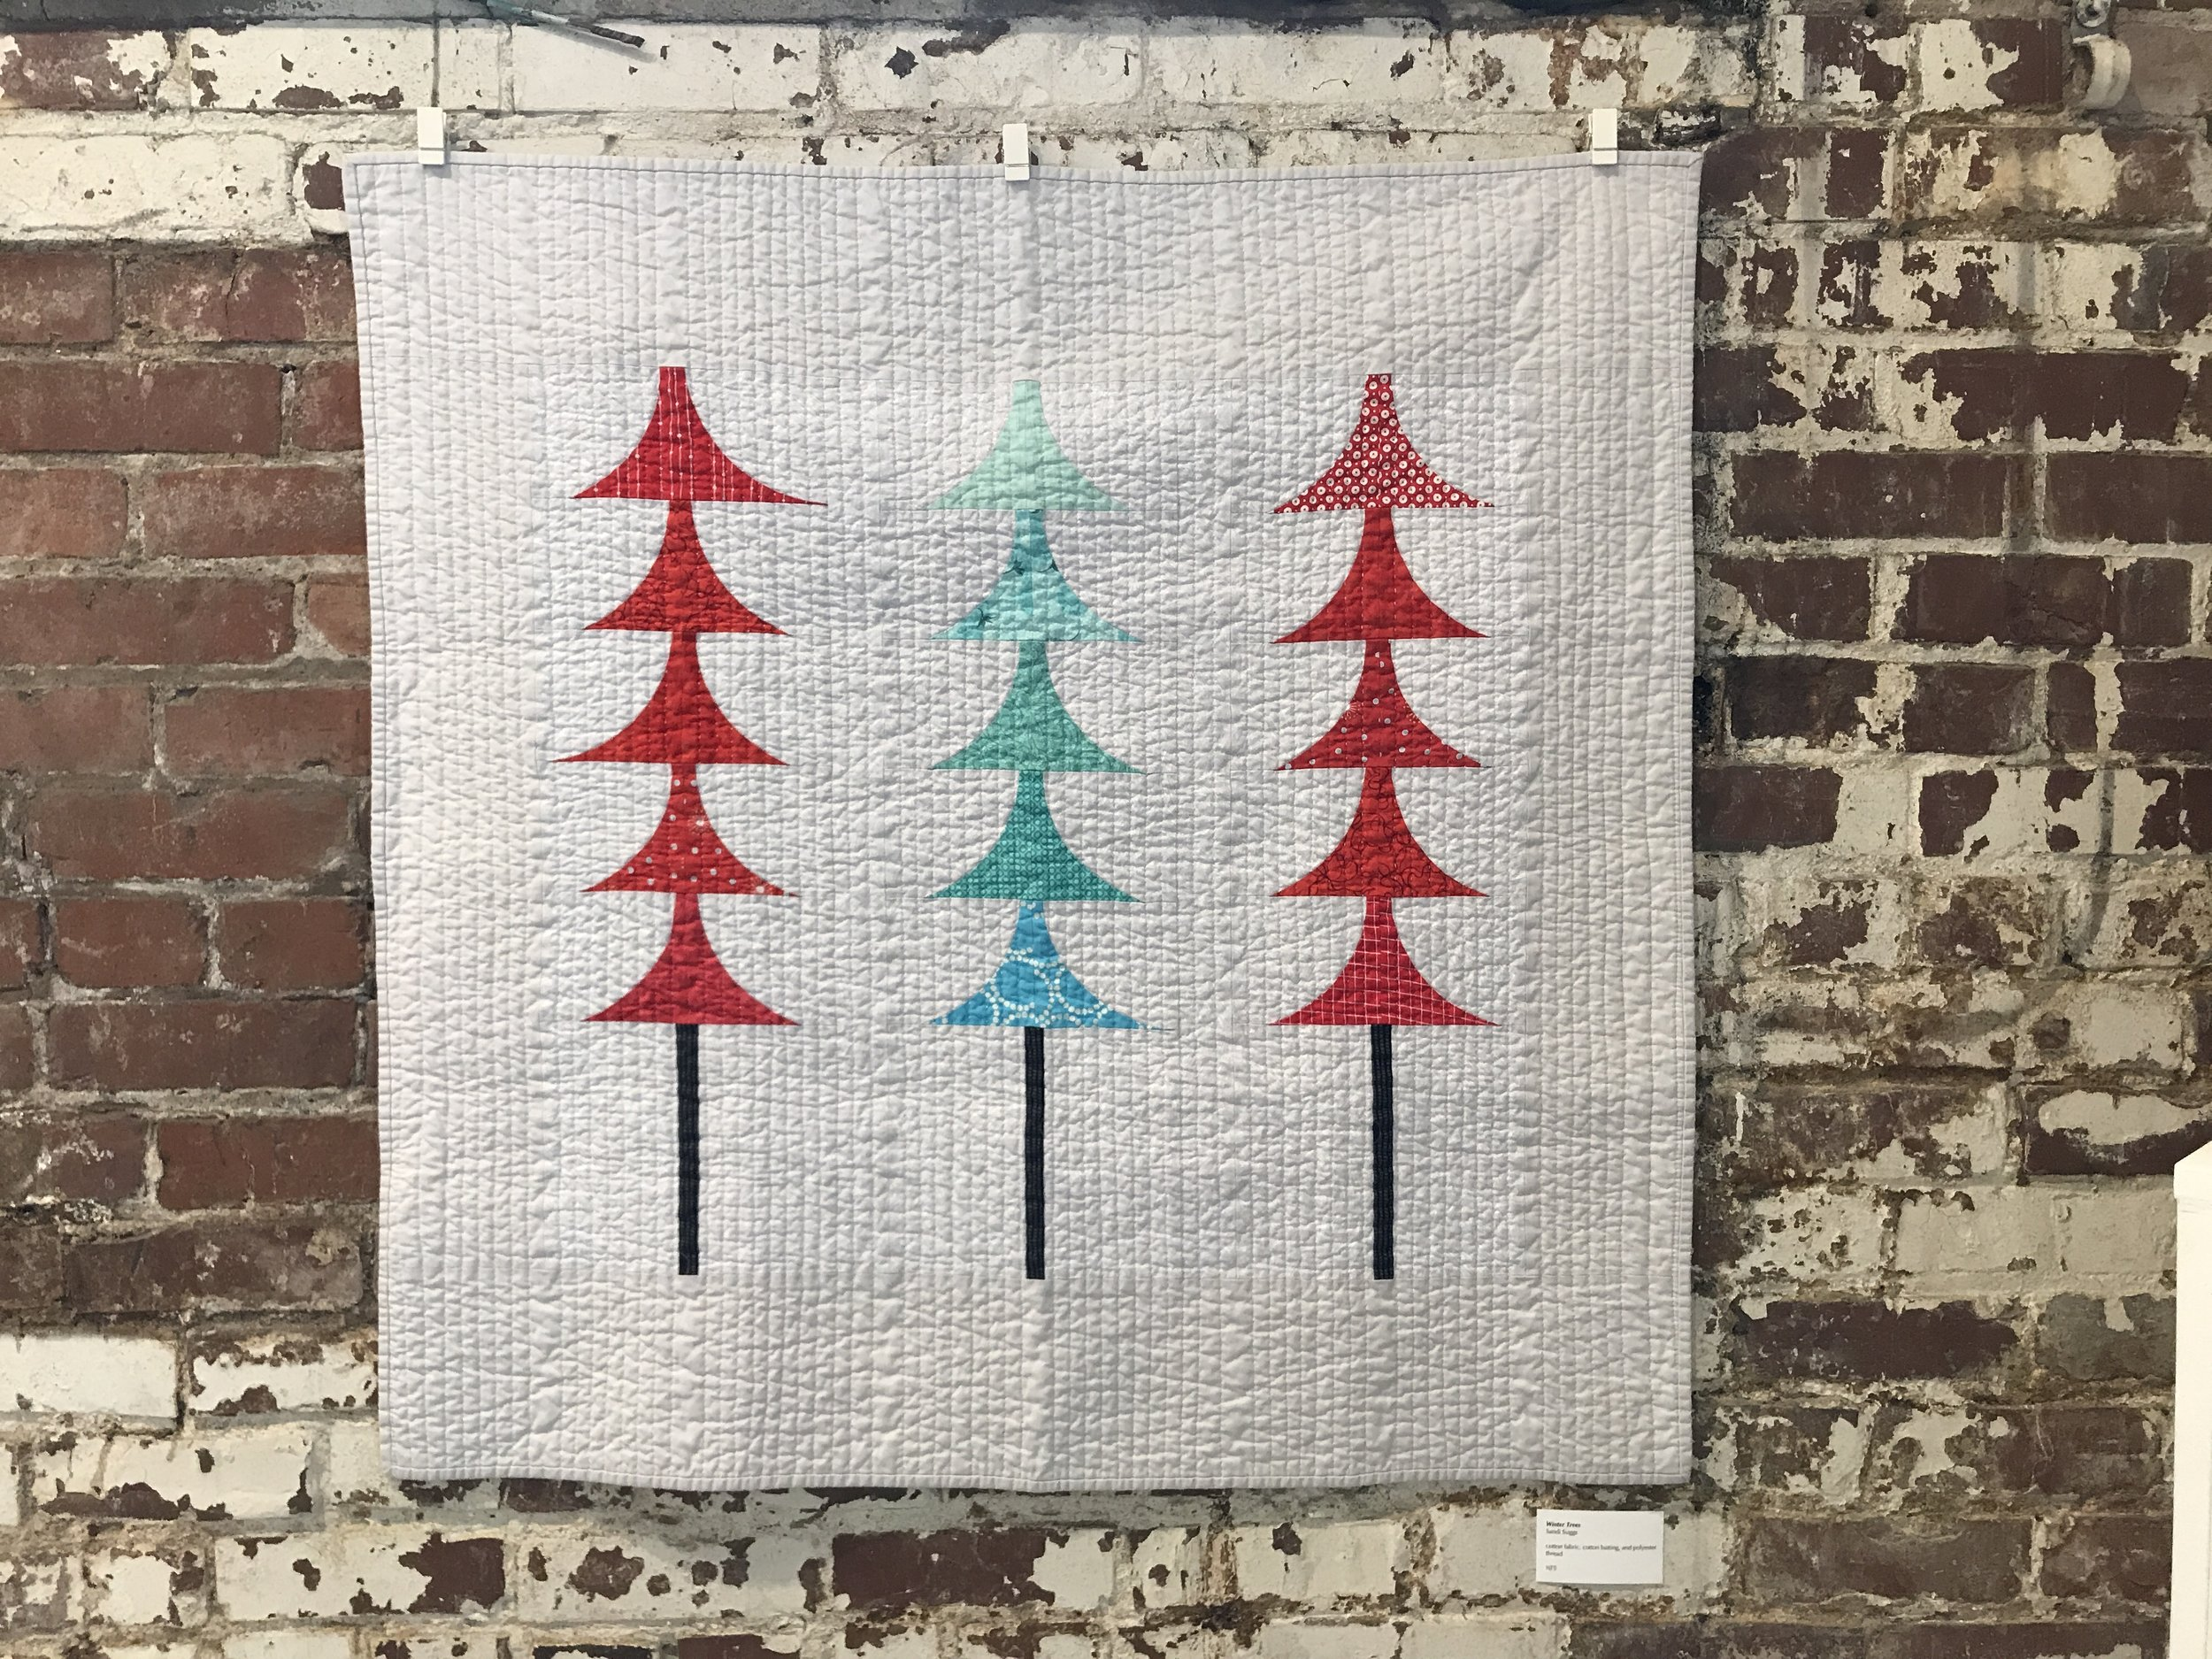 Winter Trees by Sandi Suggs